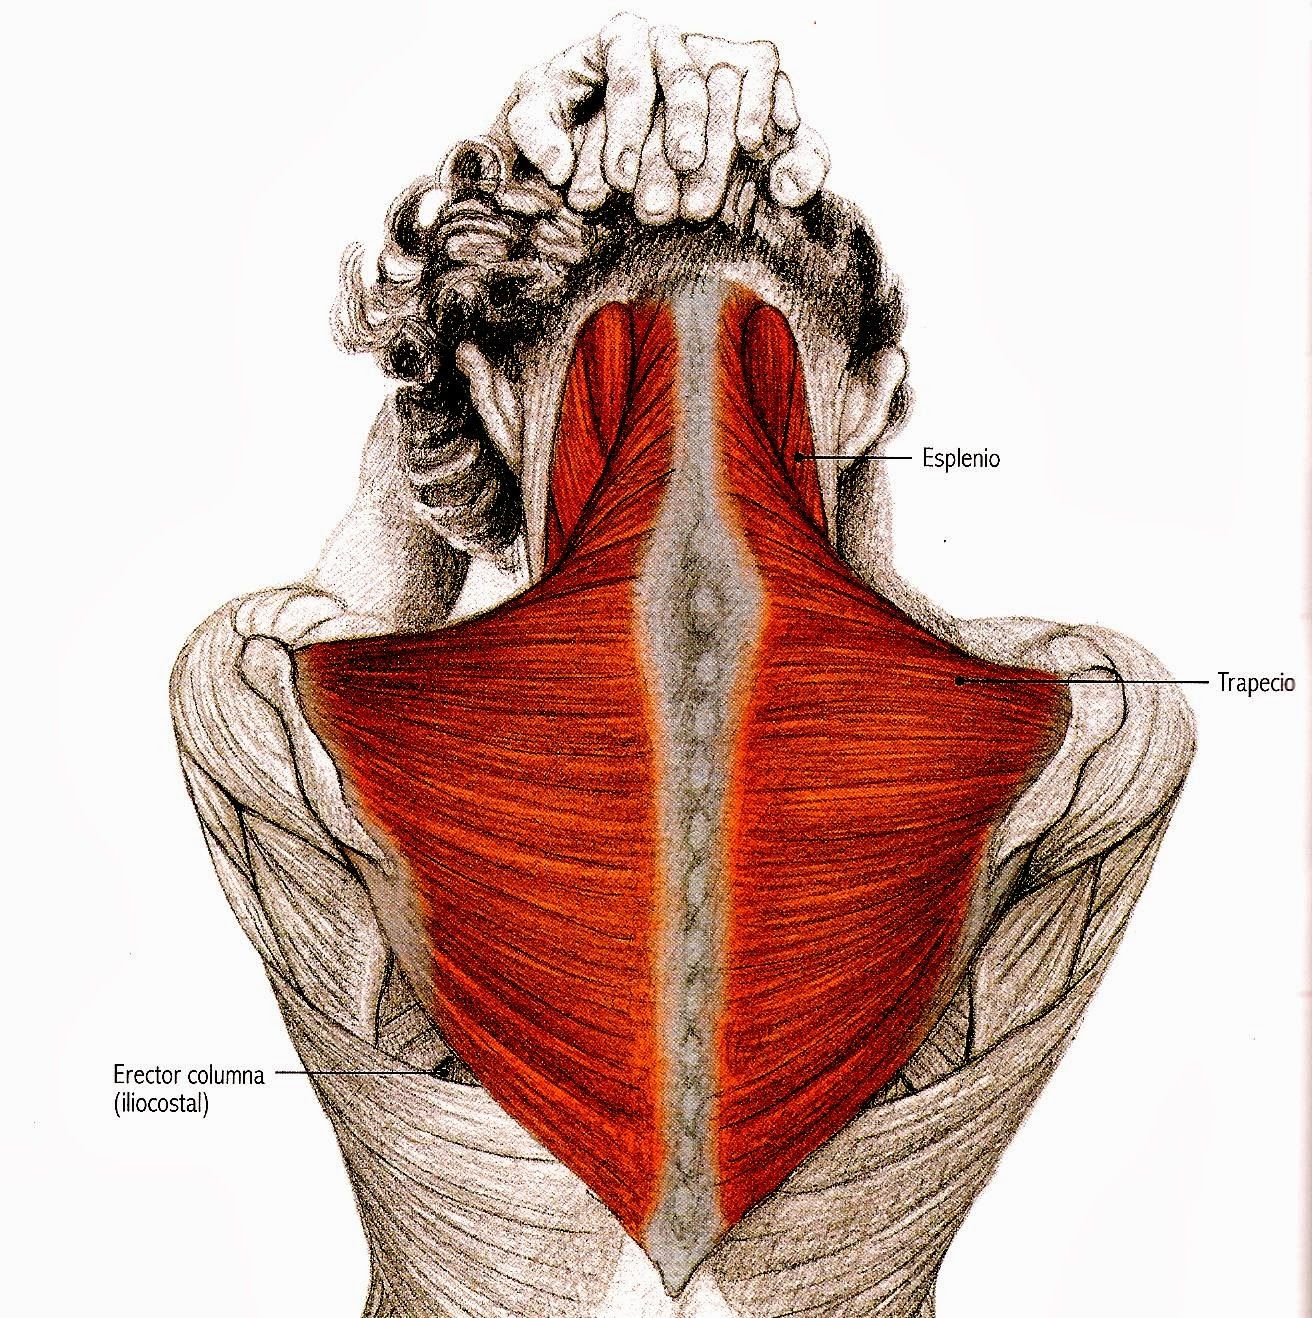 La gimnasia para el tratamiento de la hernia de la columna vertebral por bubnovskomu